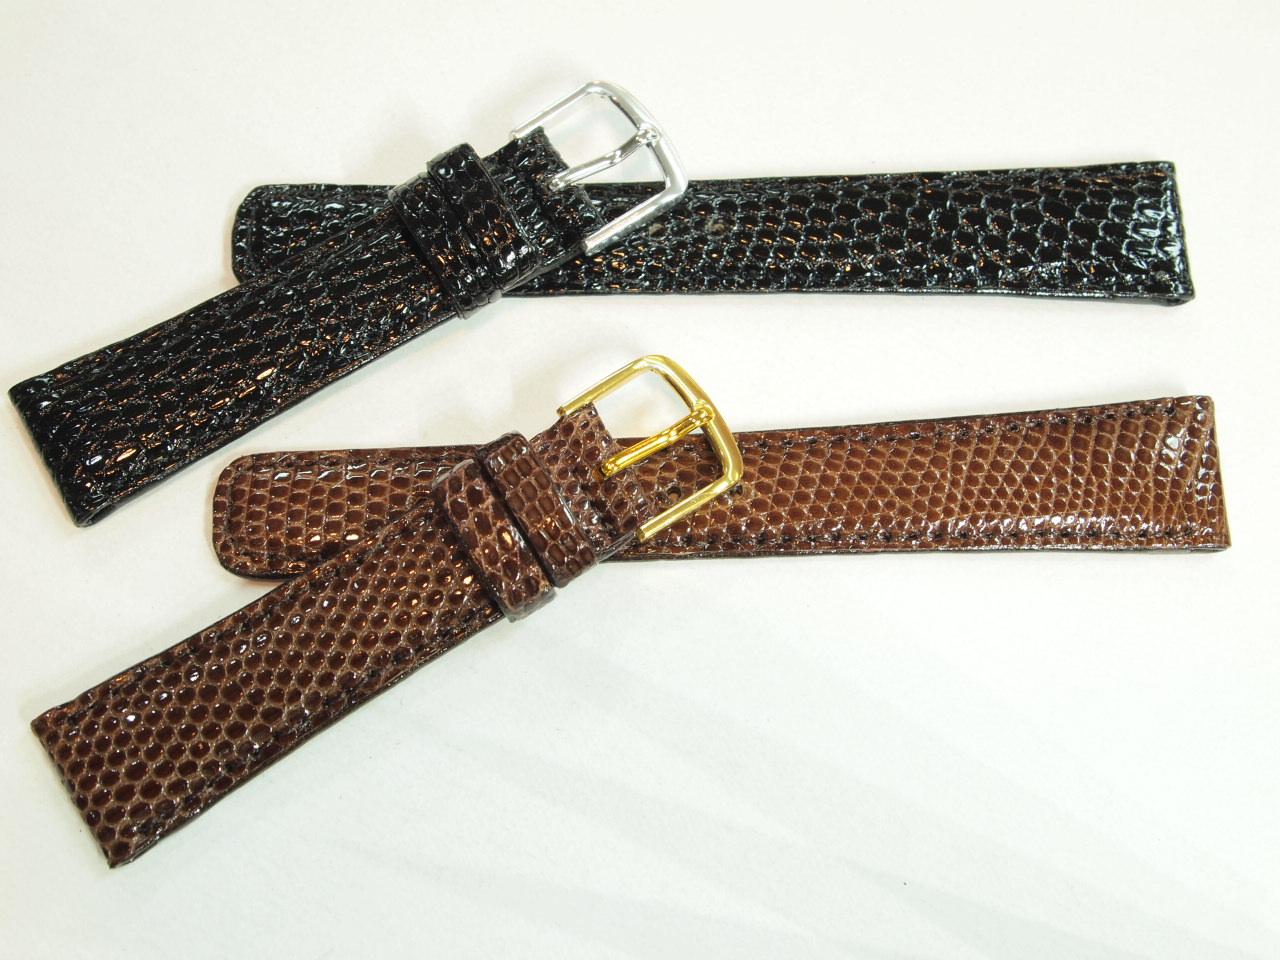 High-quality lizard (lizard) leather clock band